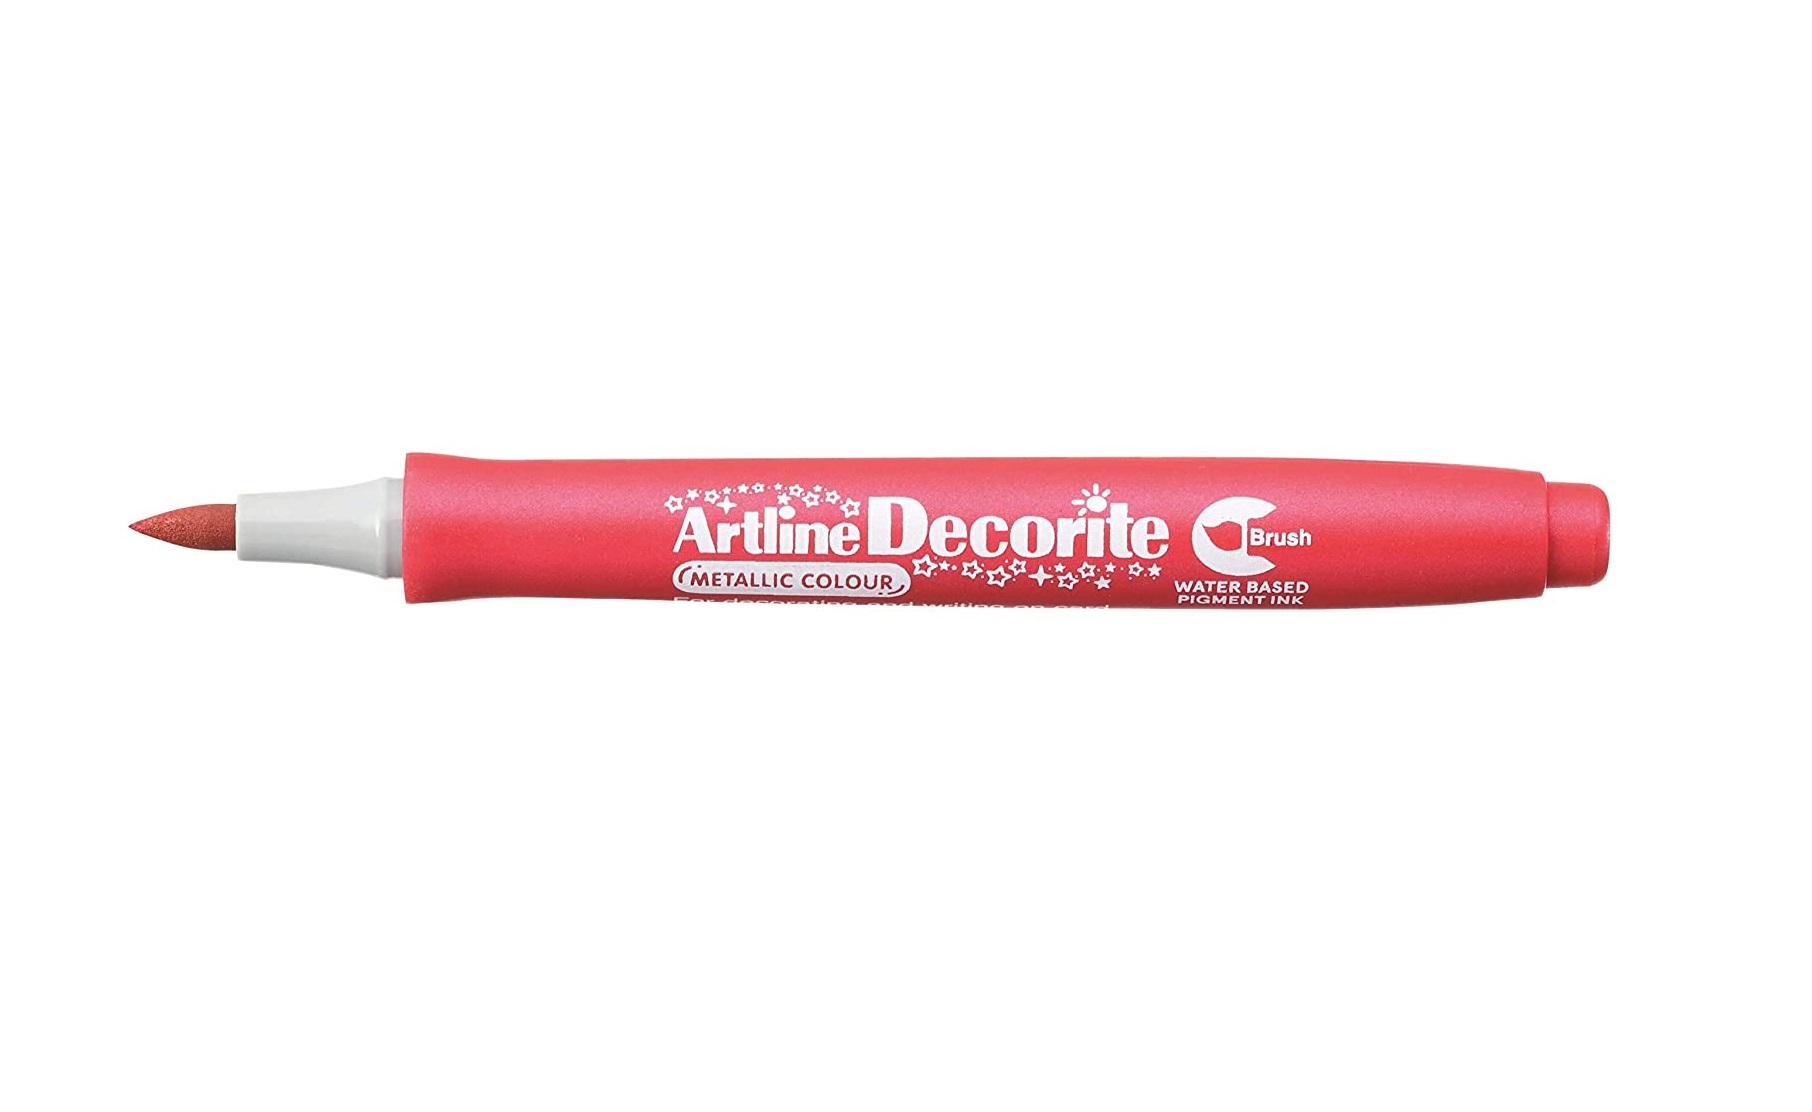 Artline Decorite Brush Marker Pen for Card, Glass, Metal and Plastic (Metallic Red)